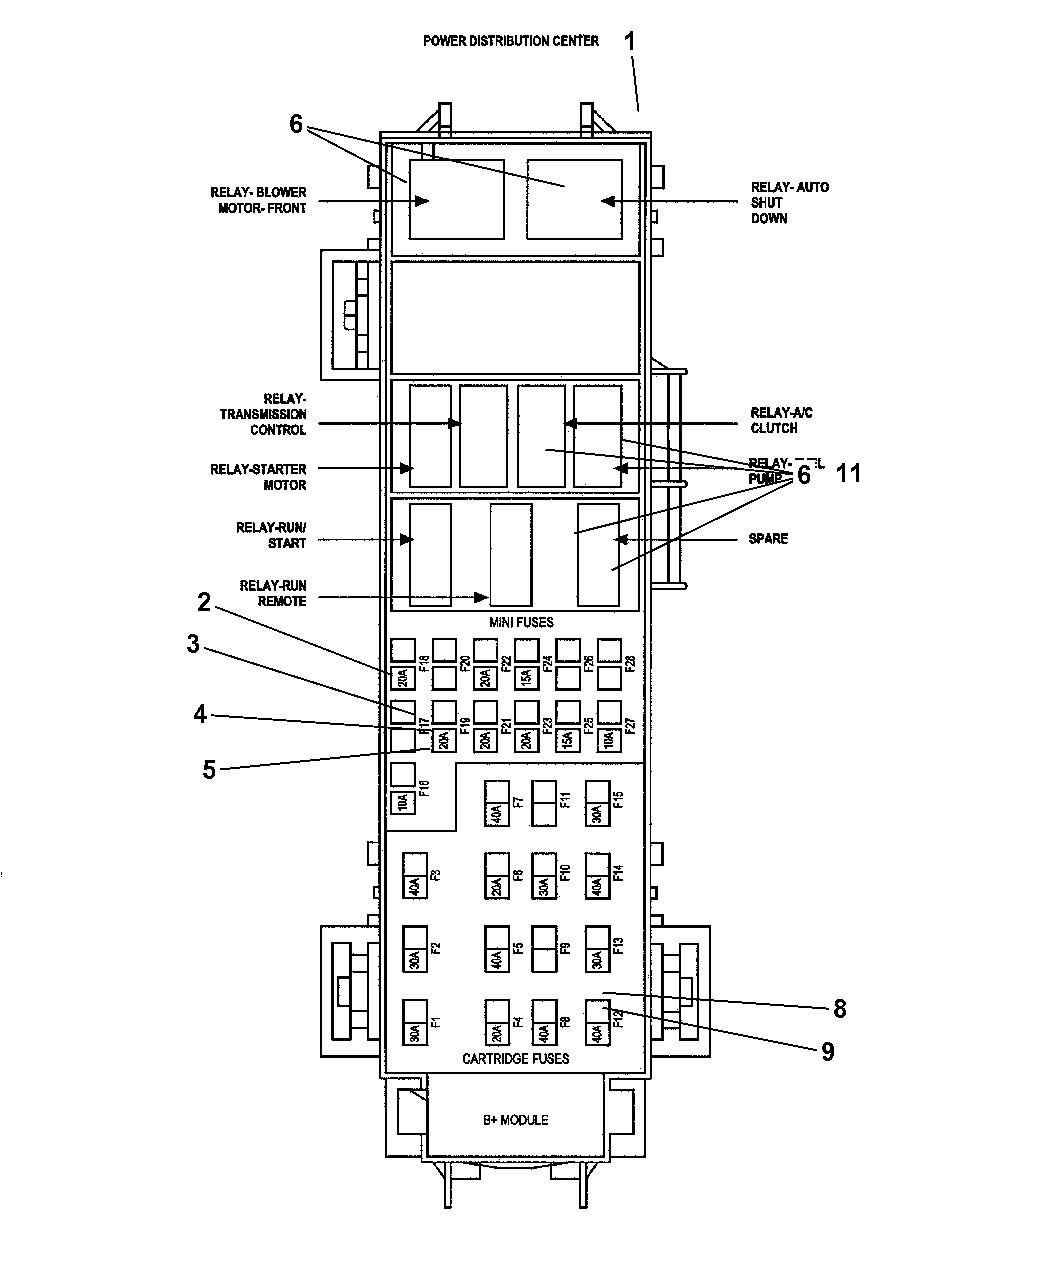 Circuit Electric For Guide: 2007 Chrysler Aspen Engine Diagram